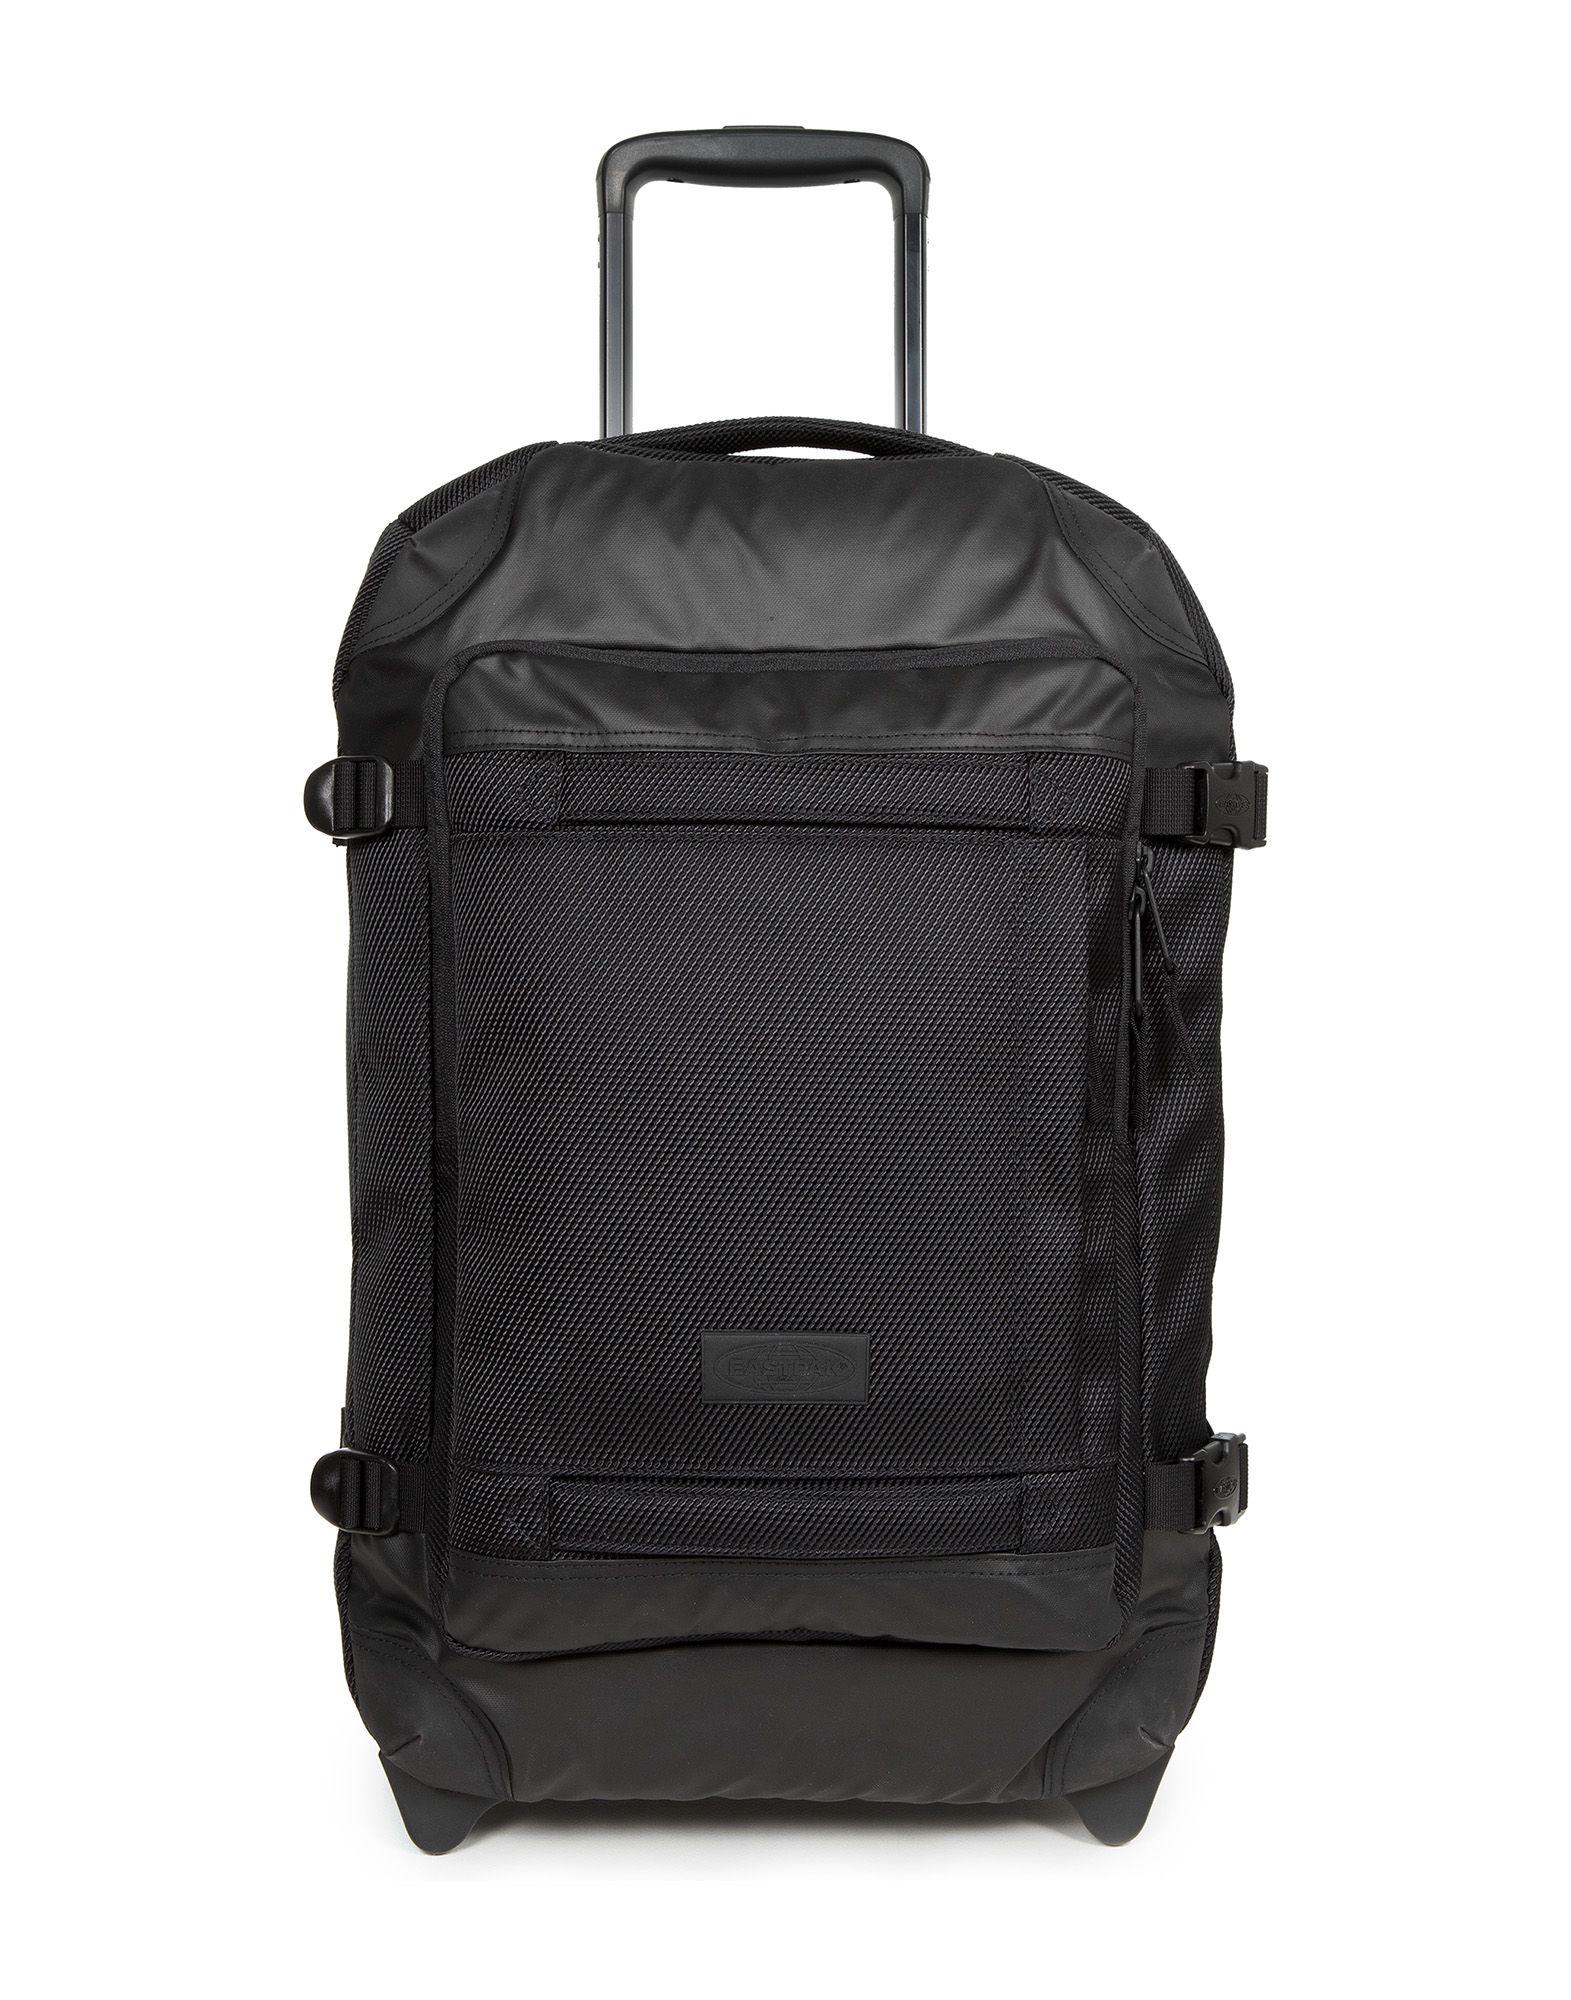 EASTPAK Чемодан/сумка на колесиках чемодан на колесиках trunki чемодан на колесиках